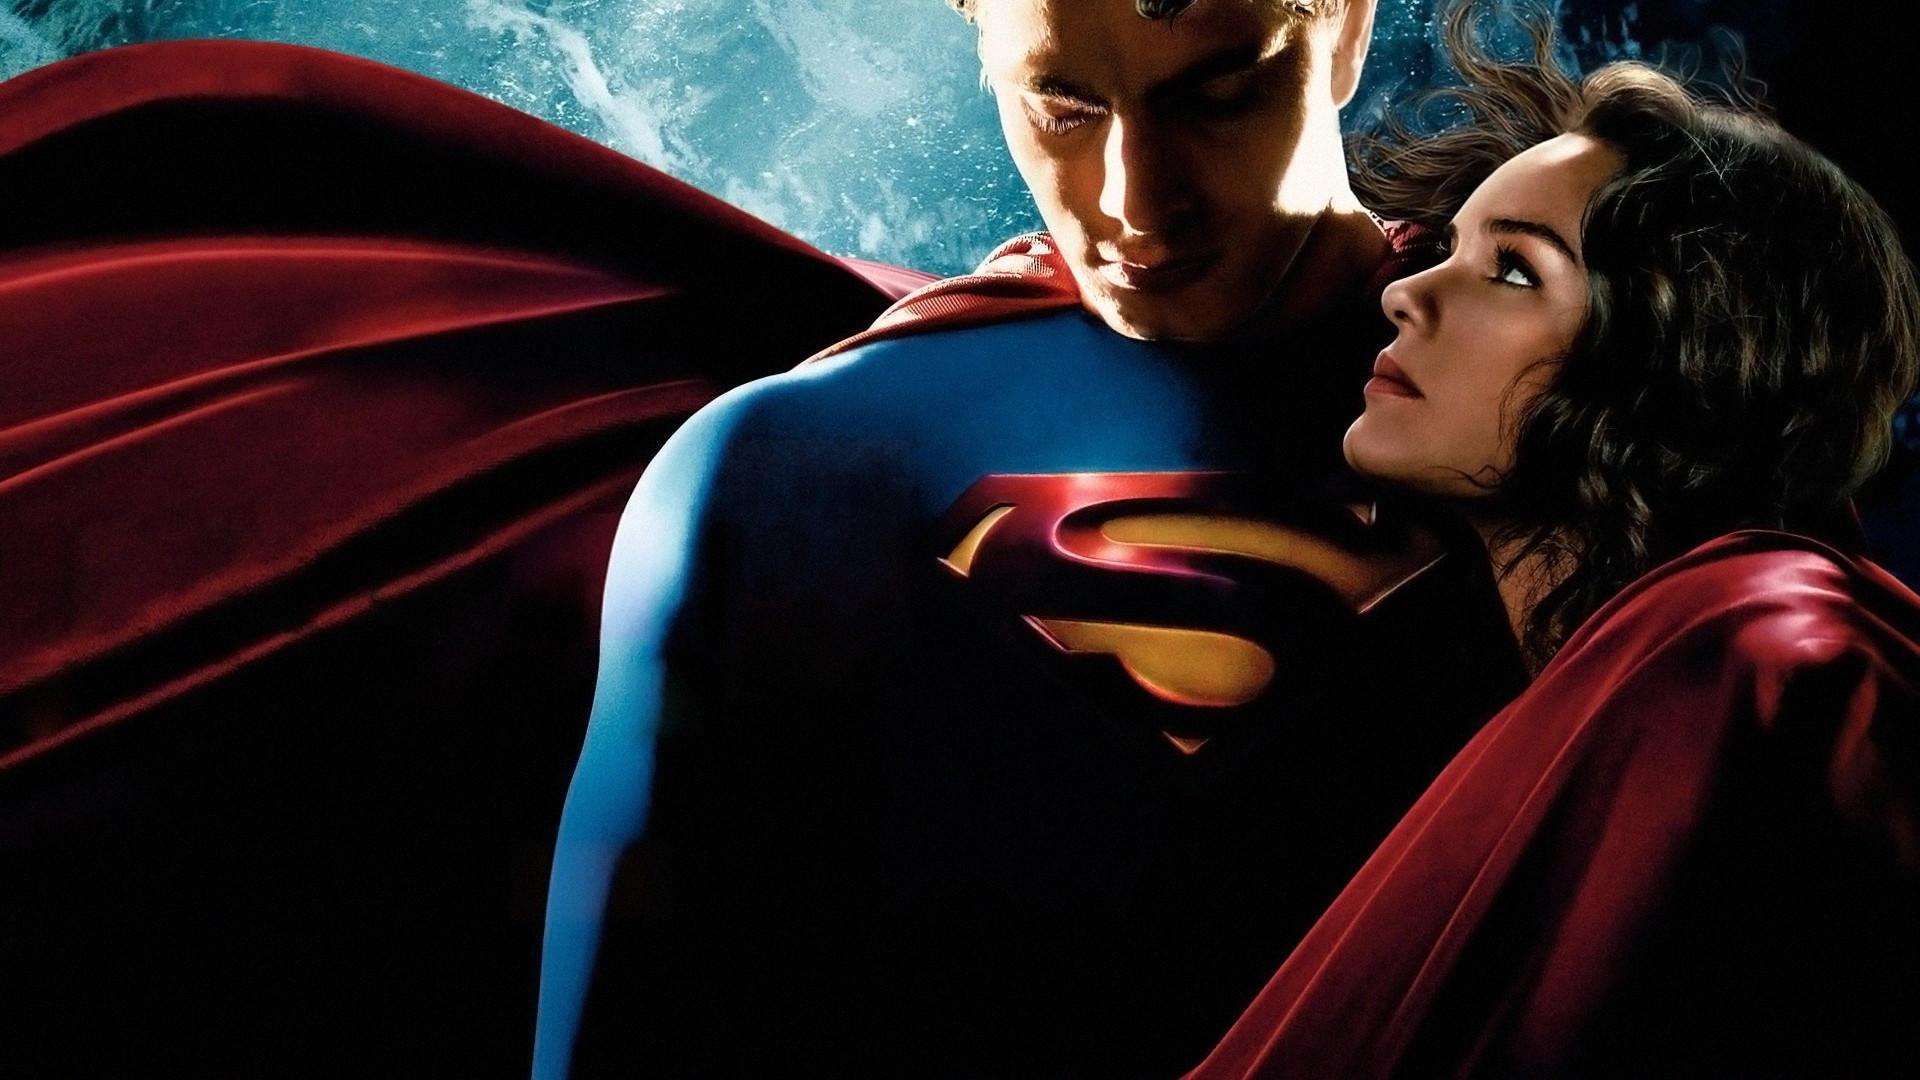 Superman Returns With Lois Lane Wallpaper